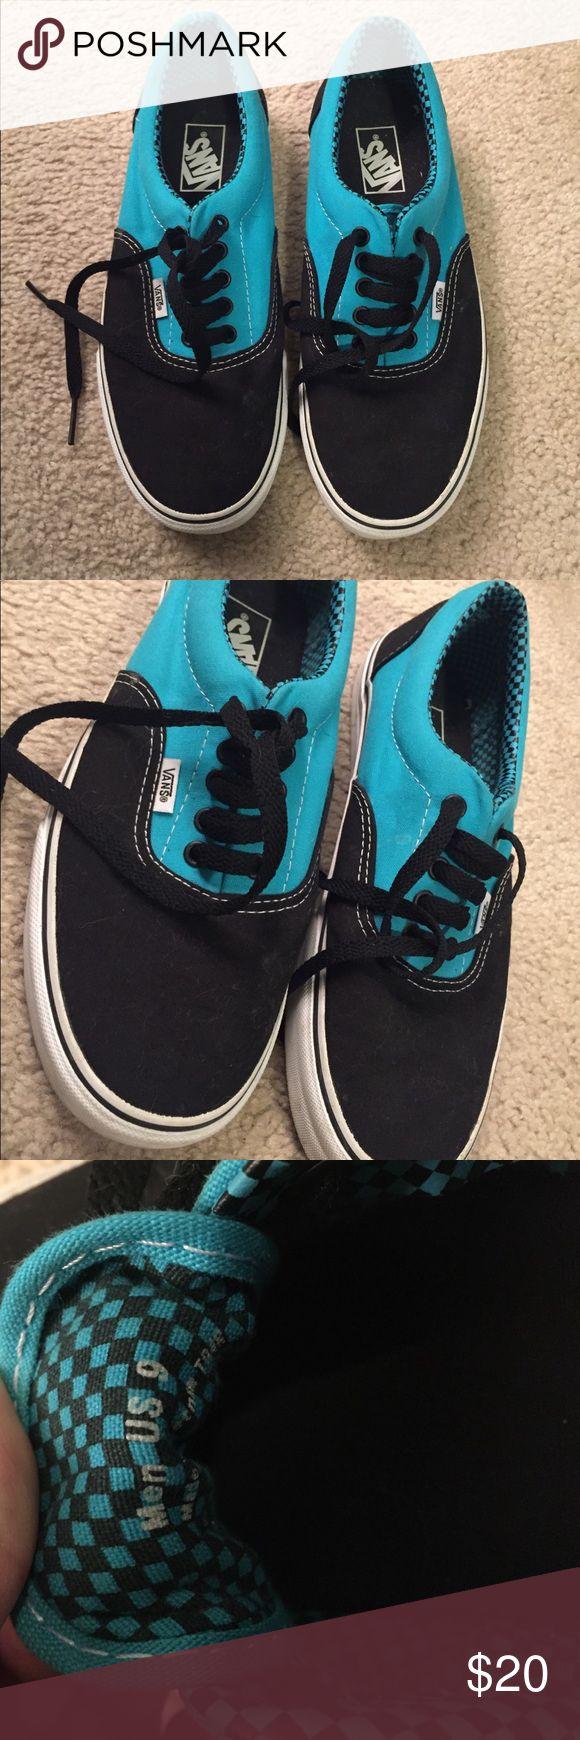 Black and teal vans Black and teal vans like new, black laces. Men's size 9 Vans Shoes Sneakers